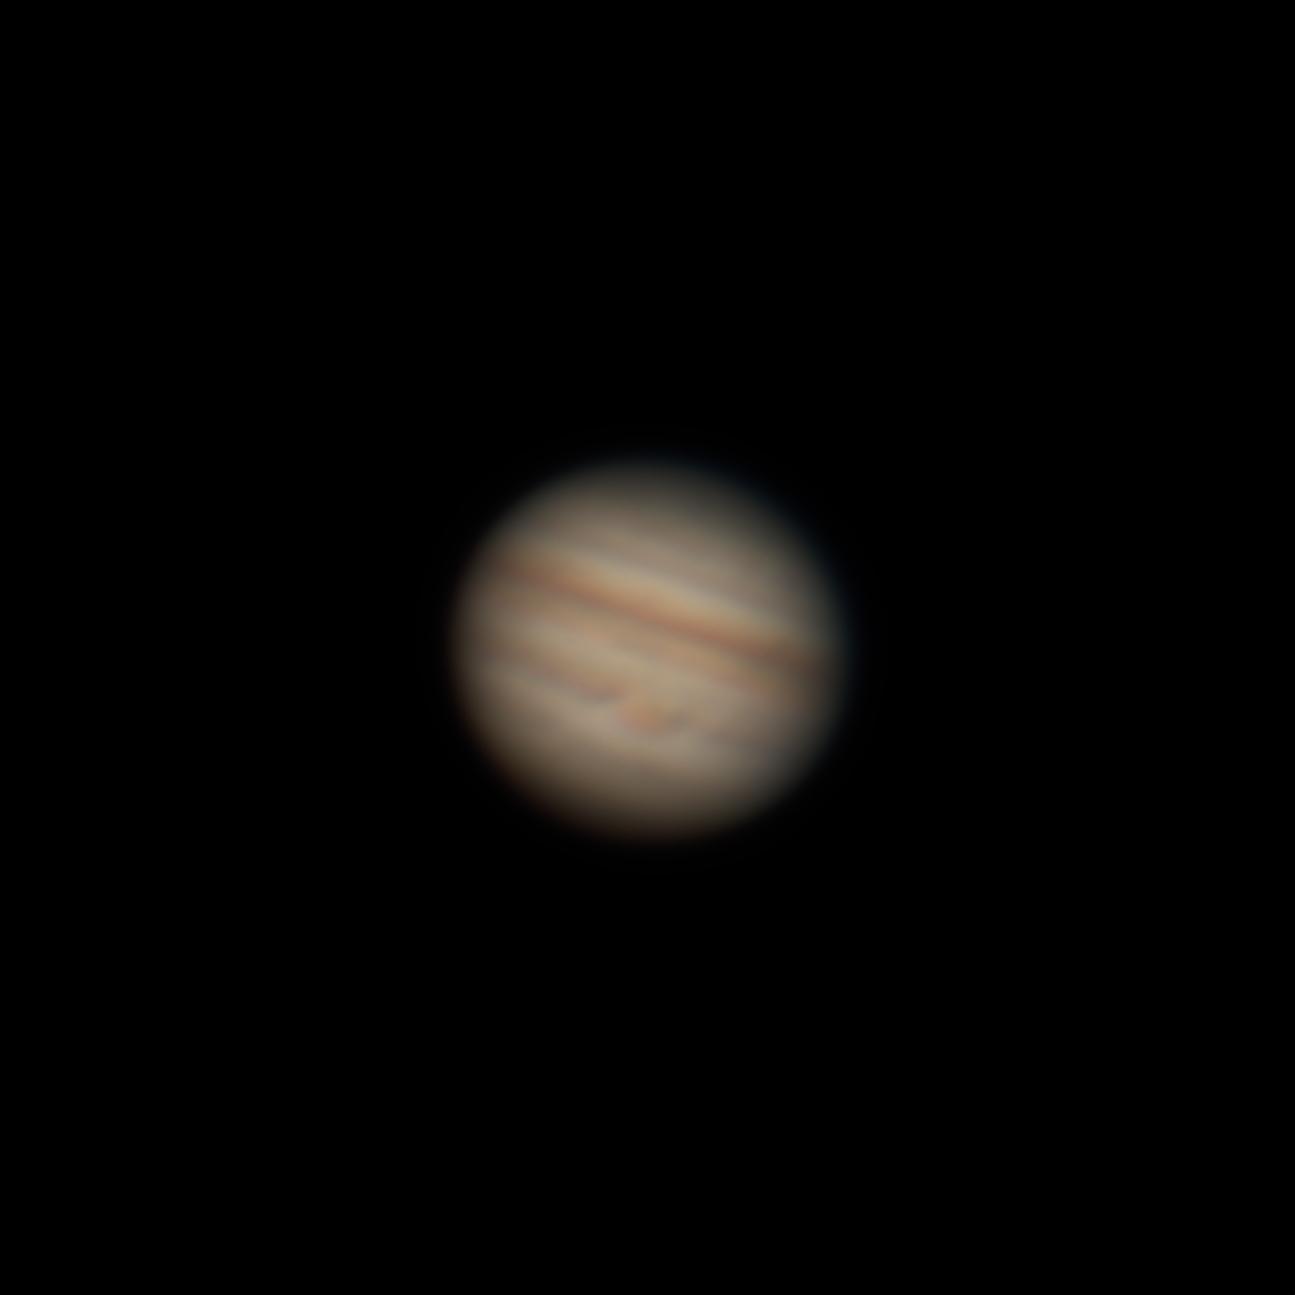 Jupiter mit Großem Roten Fleck